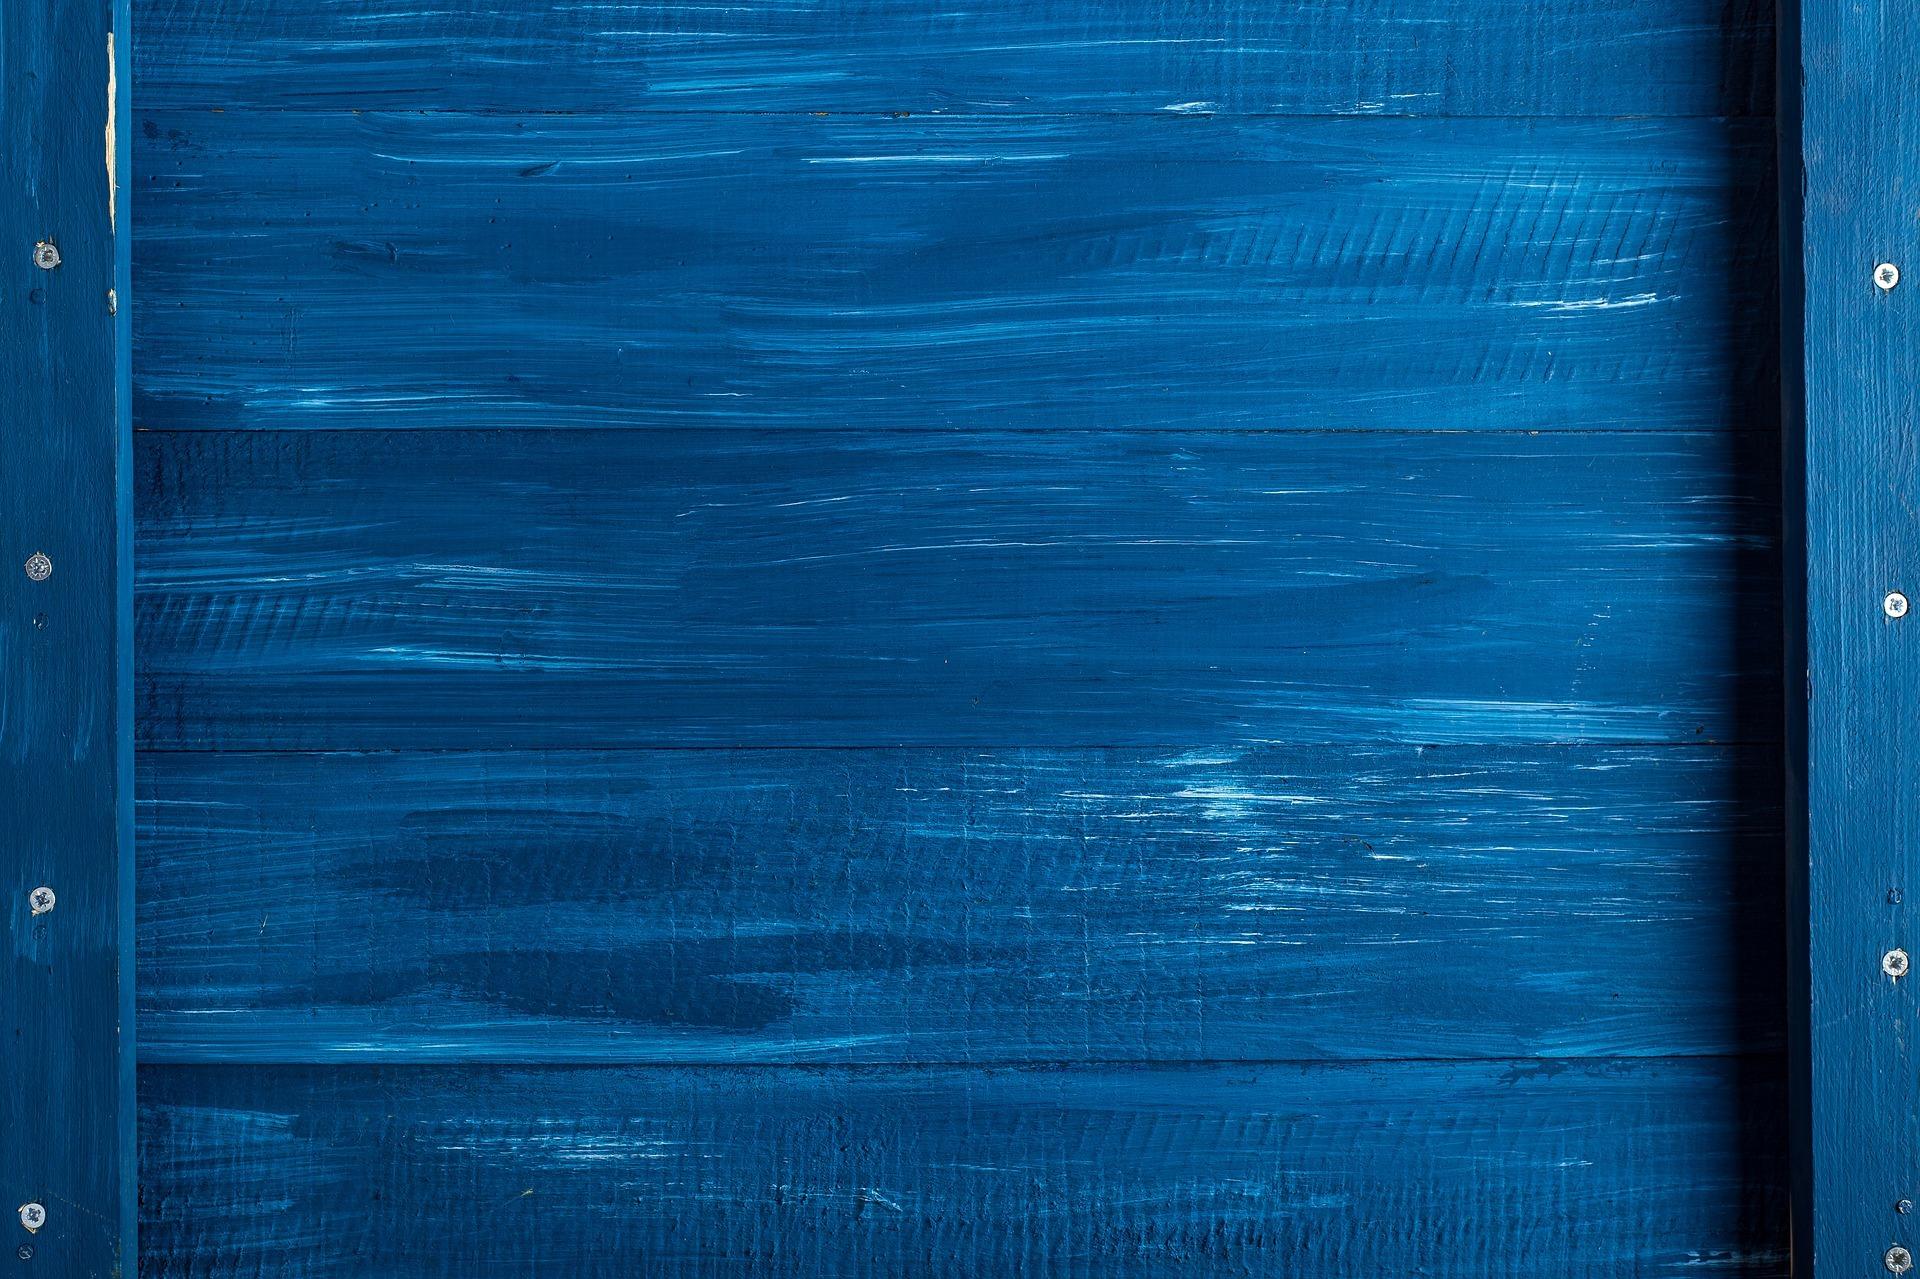 Картинка: Дерево, древесина, голубой, цвет, краска, тон